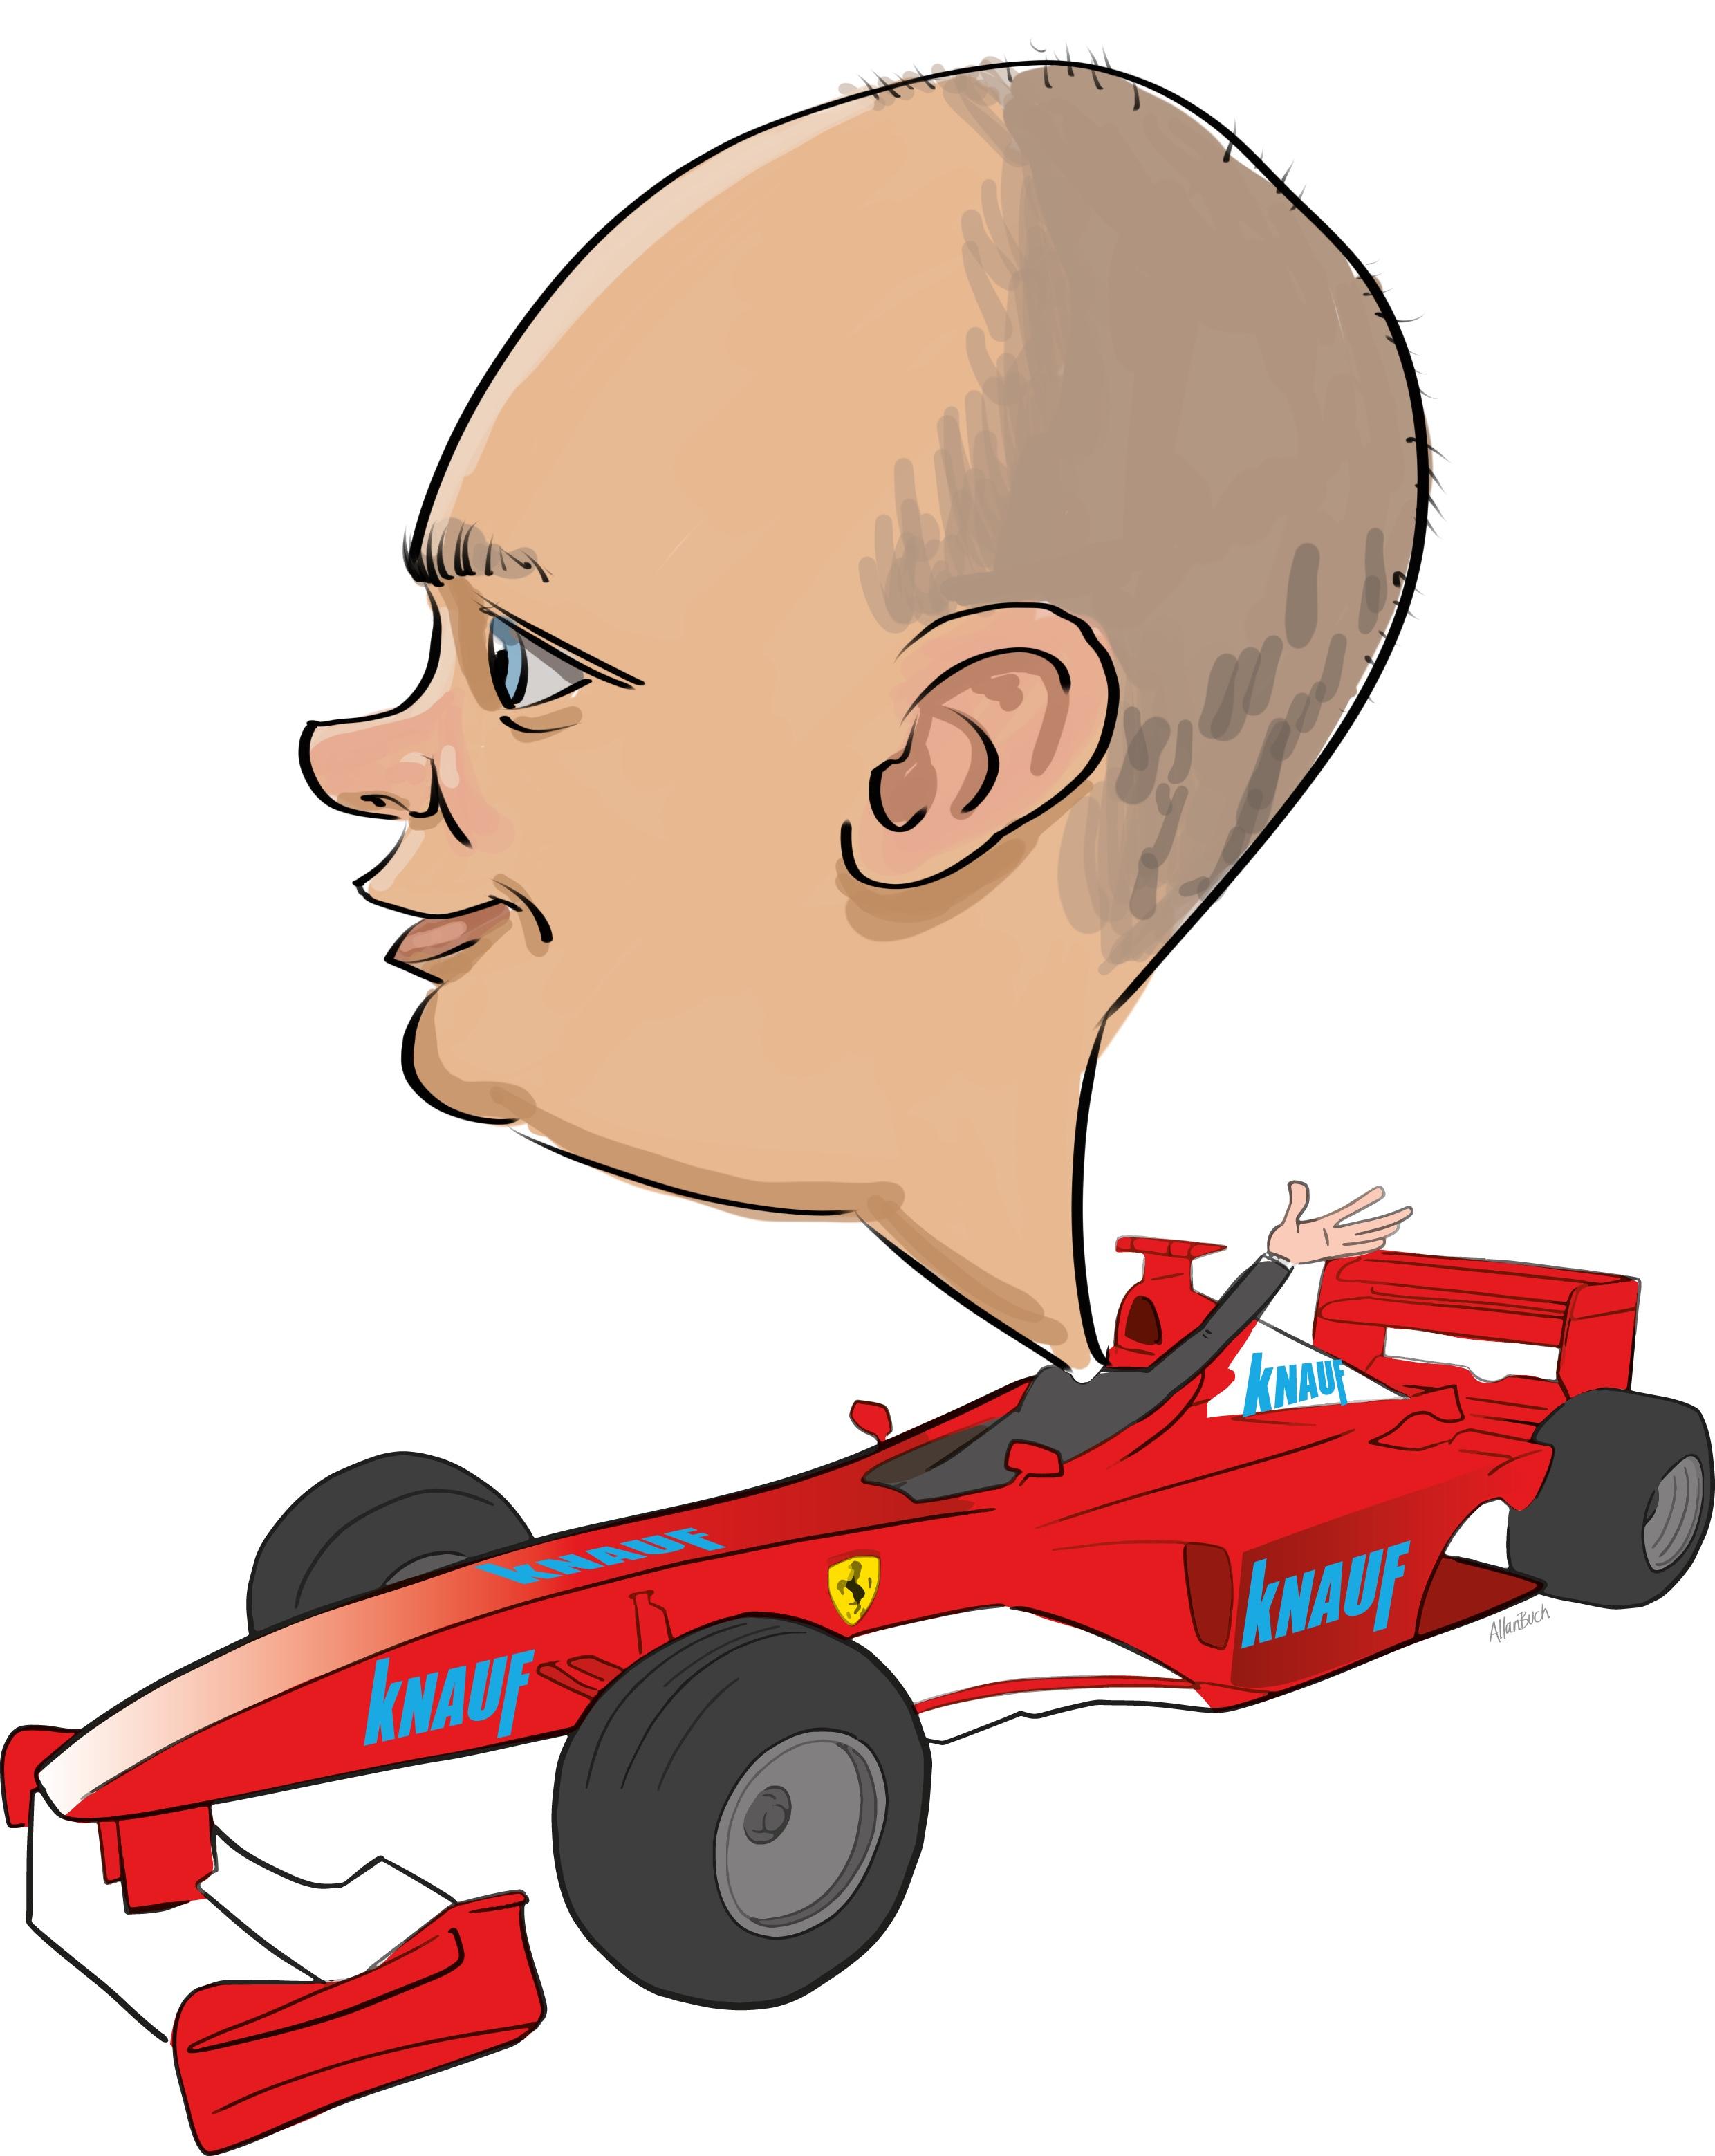 ipad Live karikatur med Allan Buch. farve profiltegning13